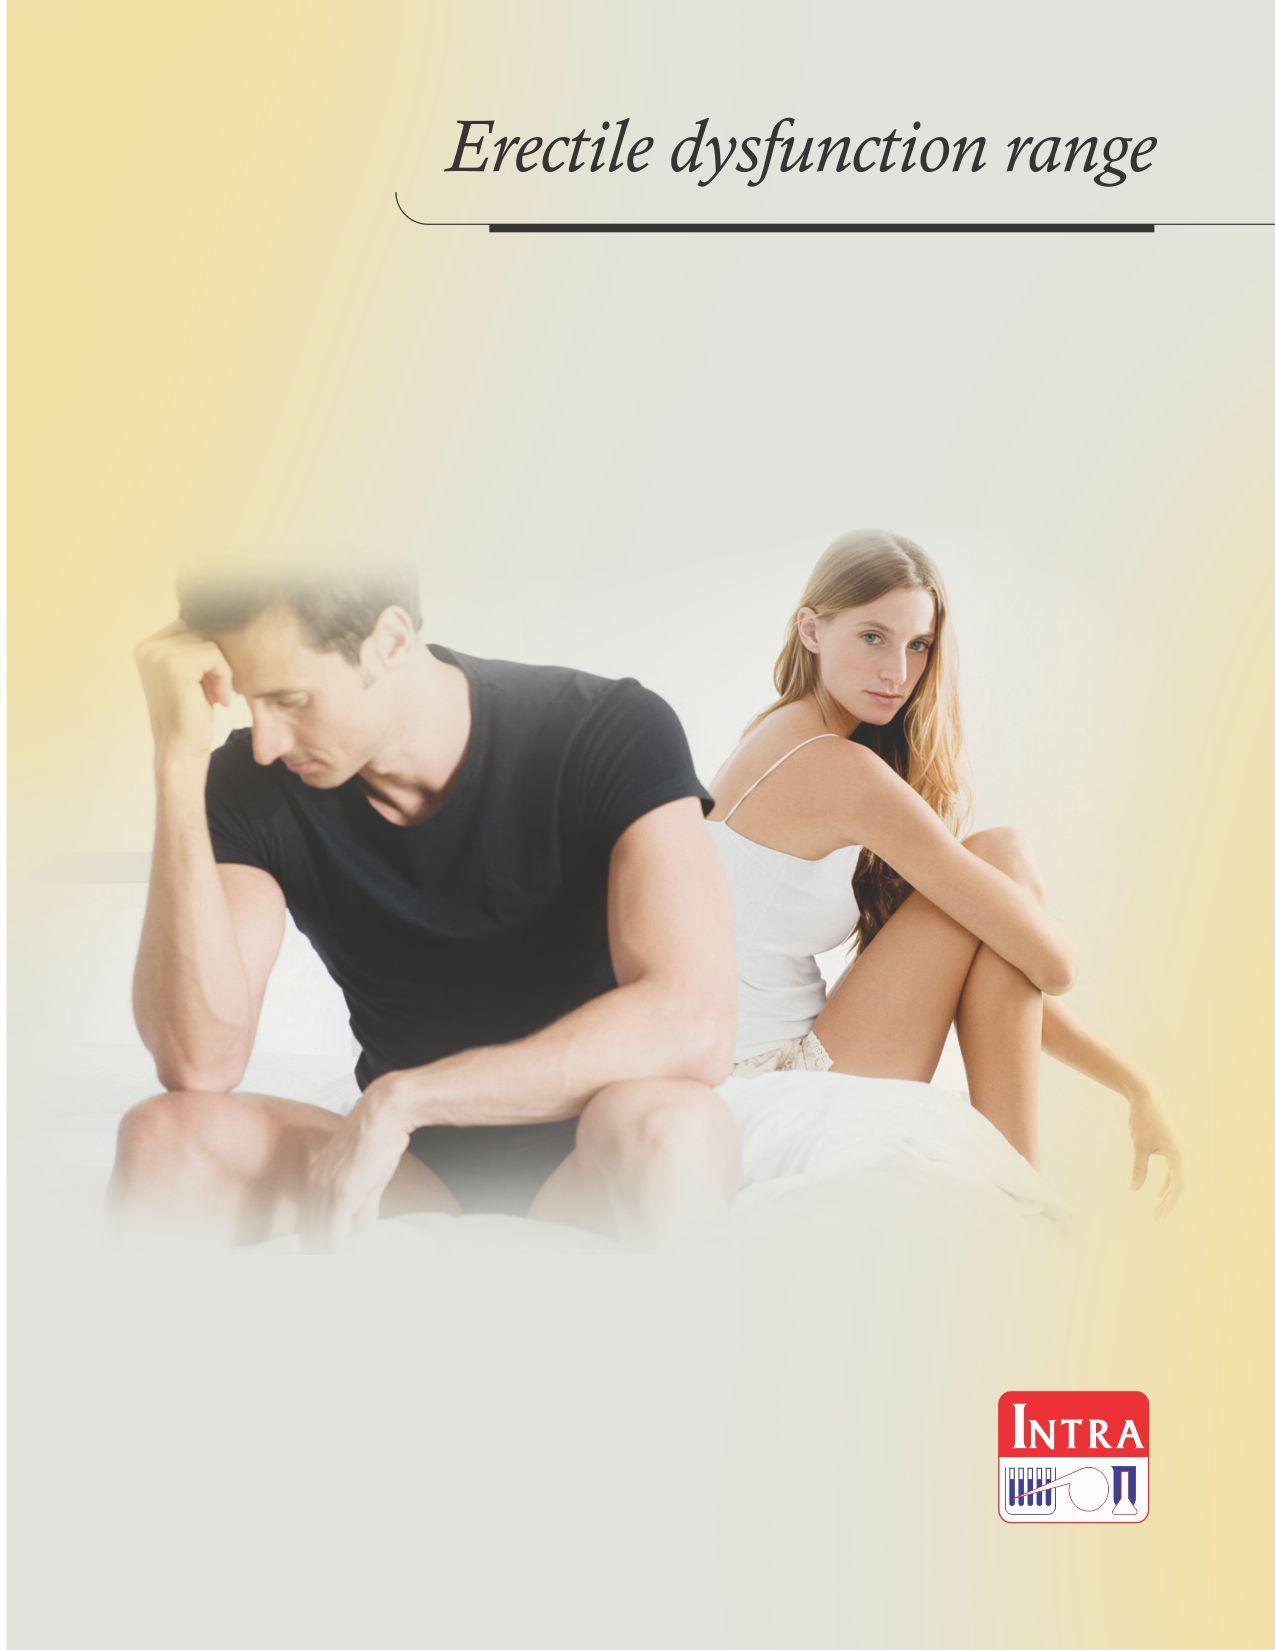 Sexspielzeug erektile Dysfunktion